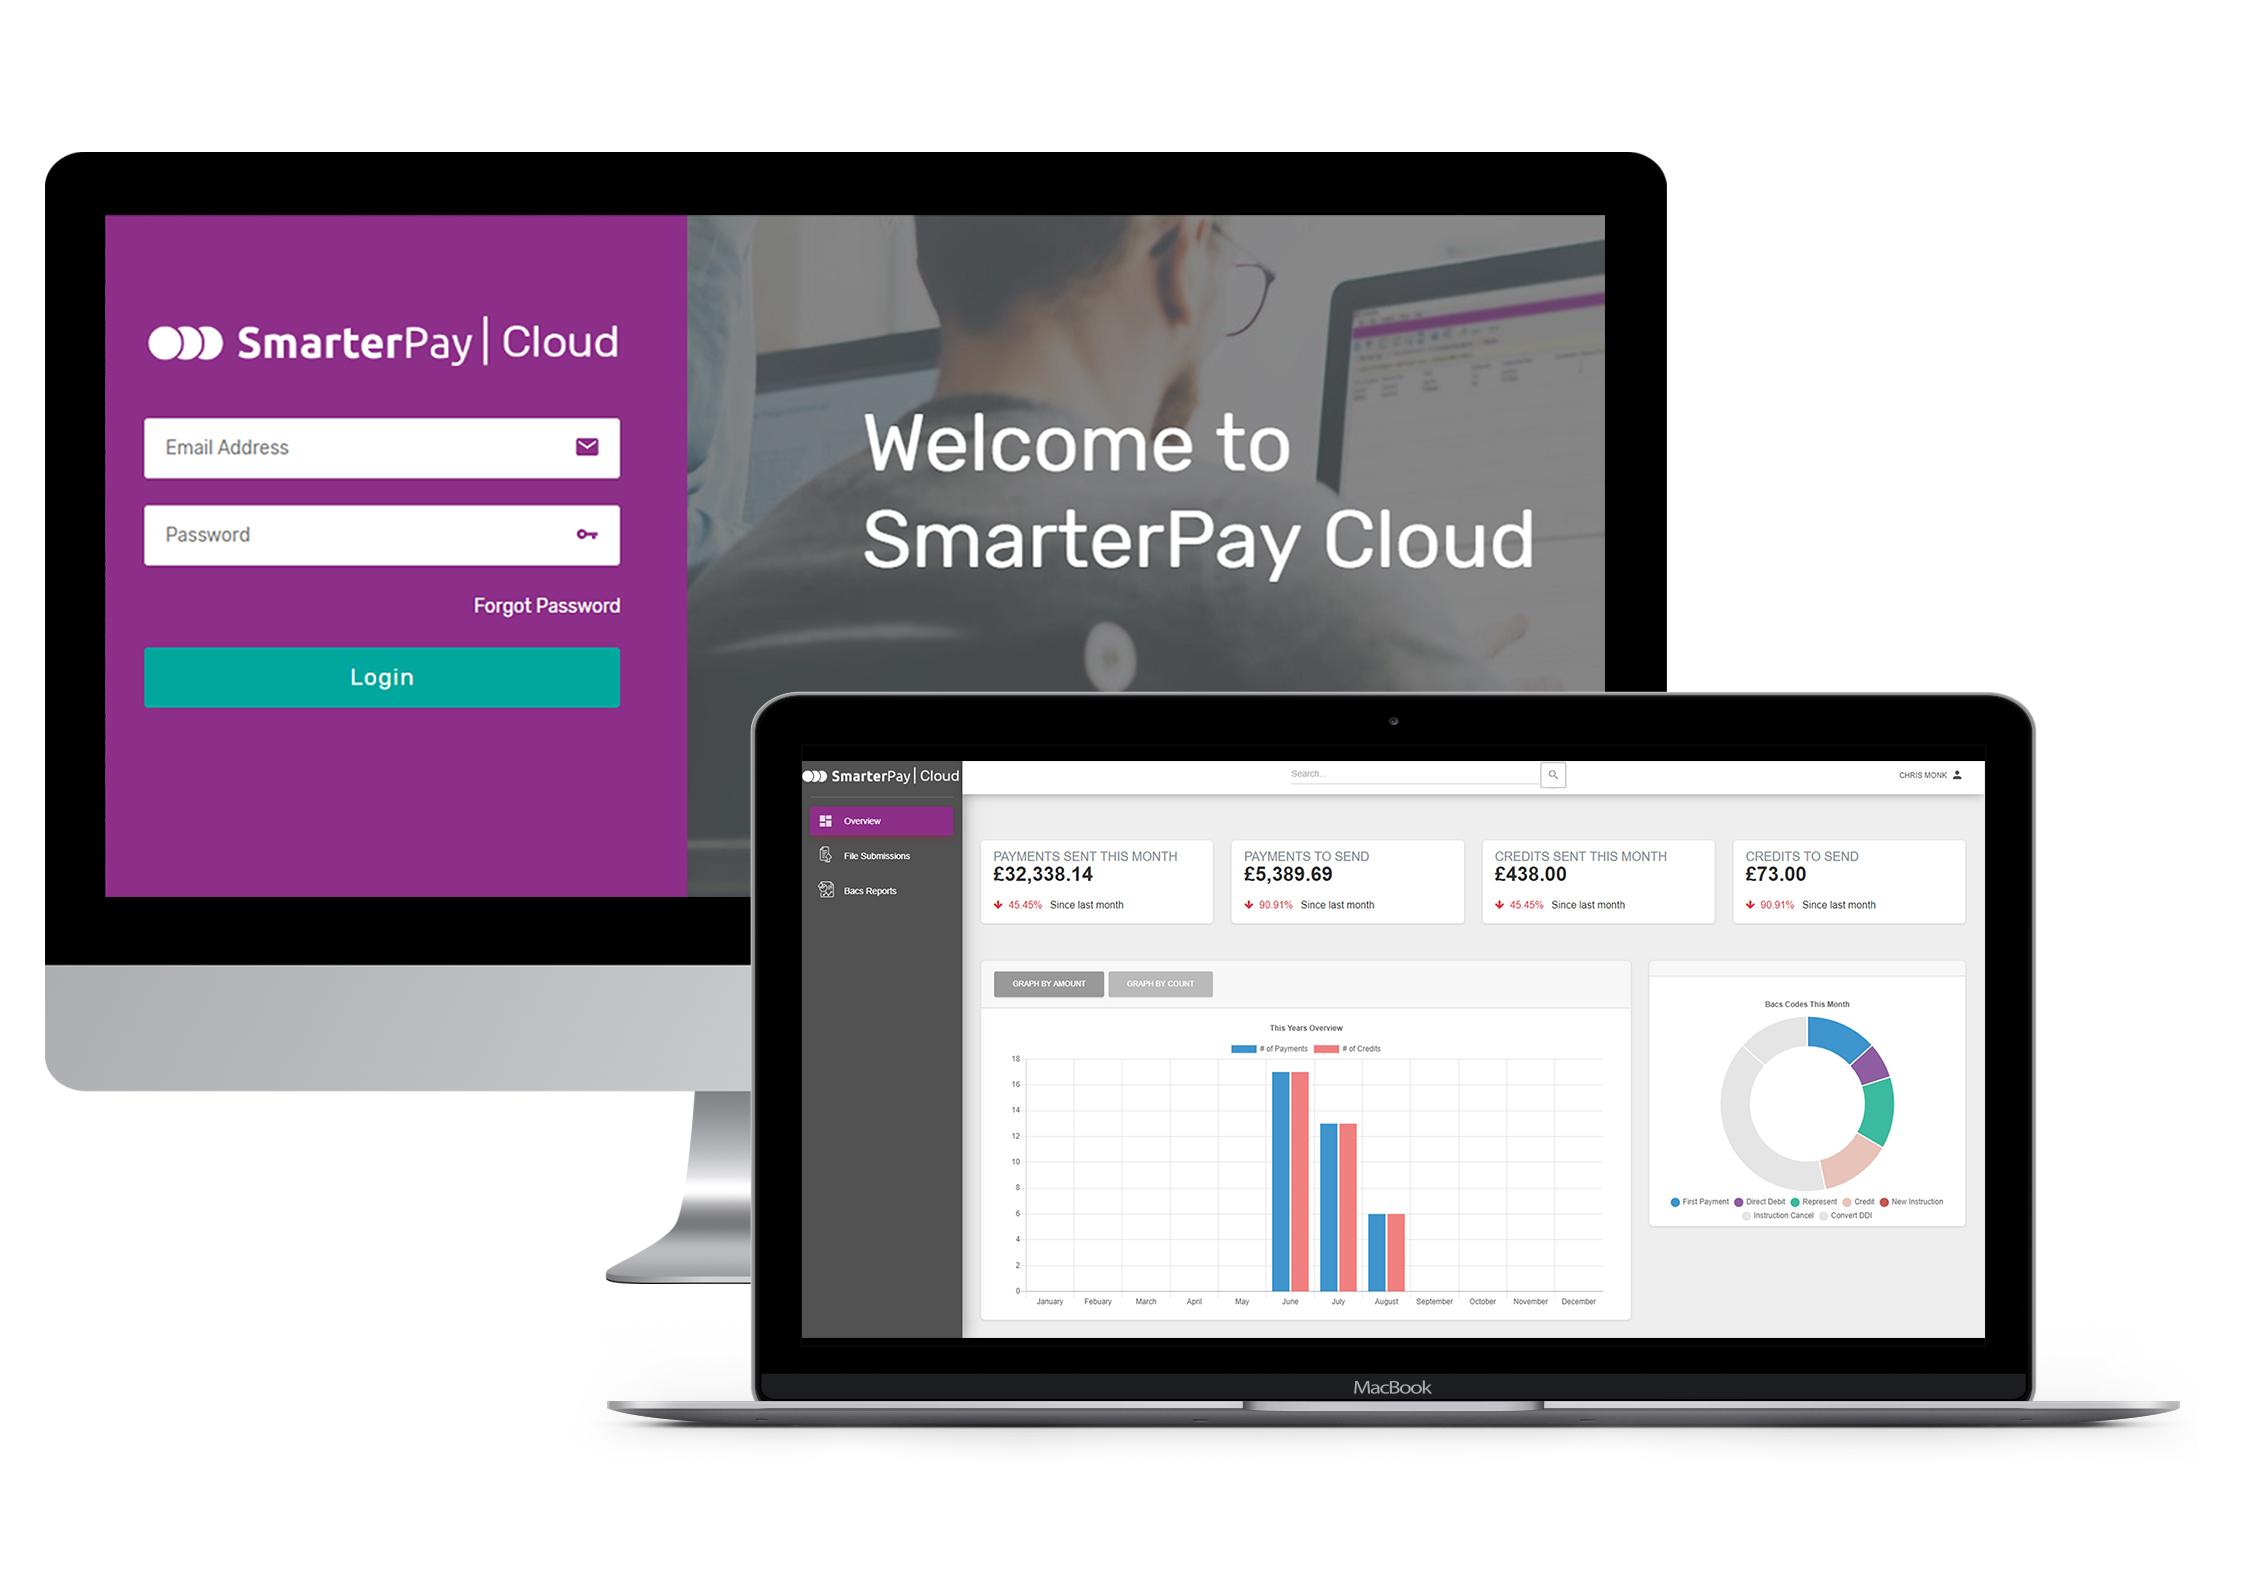 SmarterPay Cloud Interface